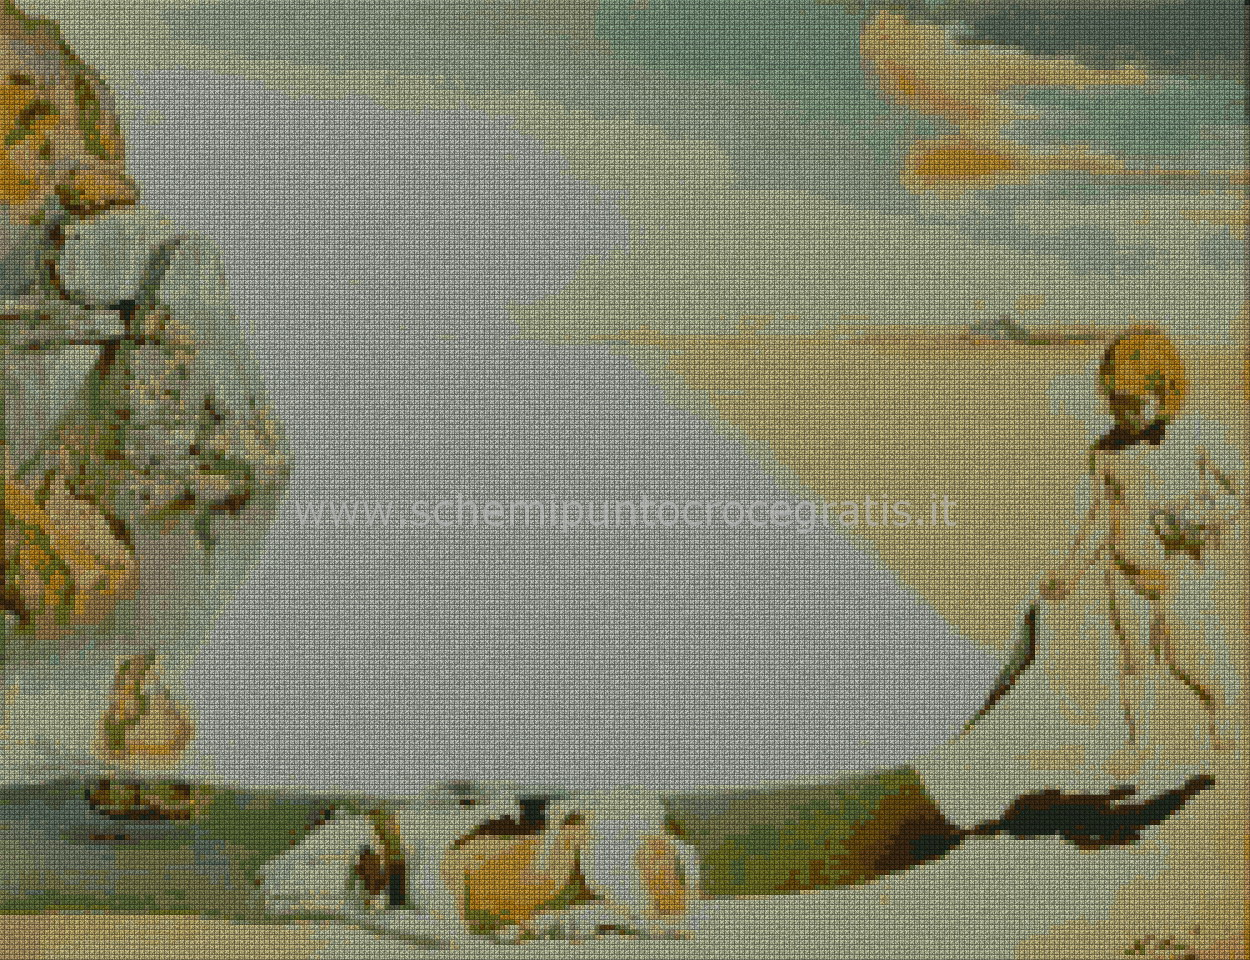 pittori_moderni/dali/dali32.jpg